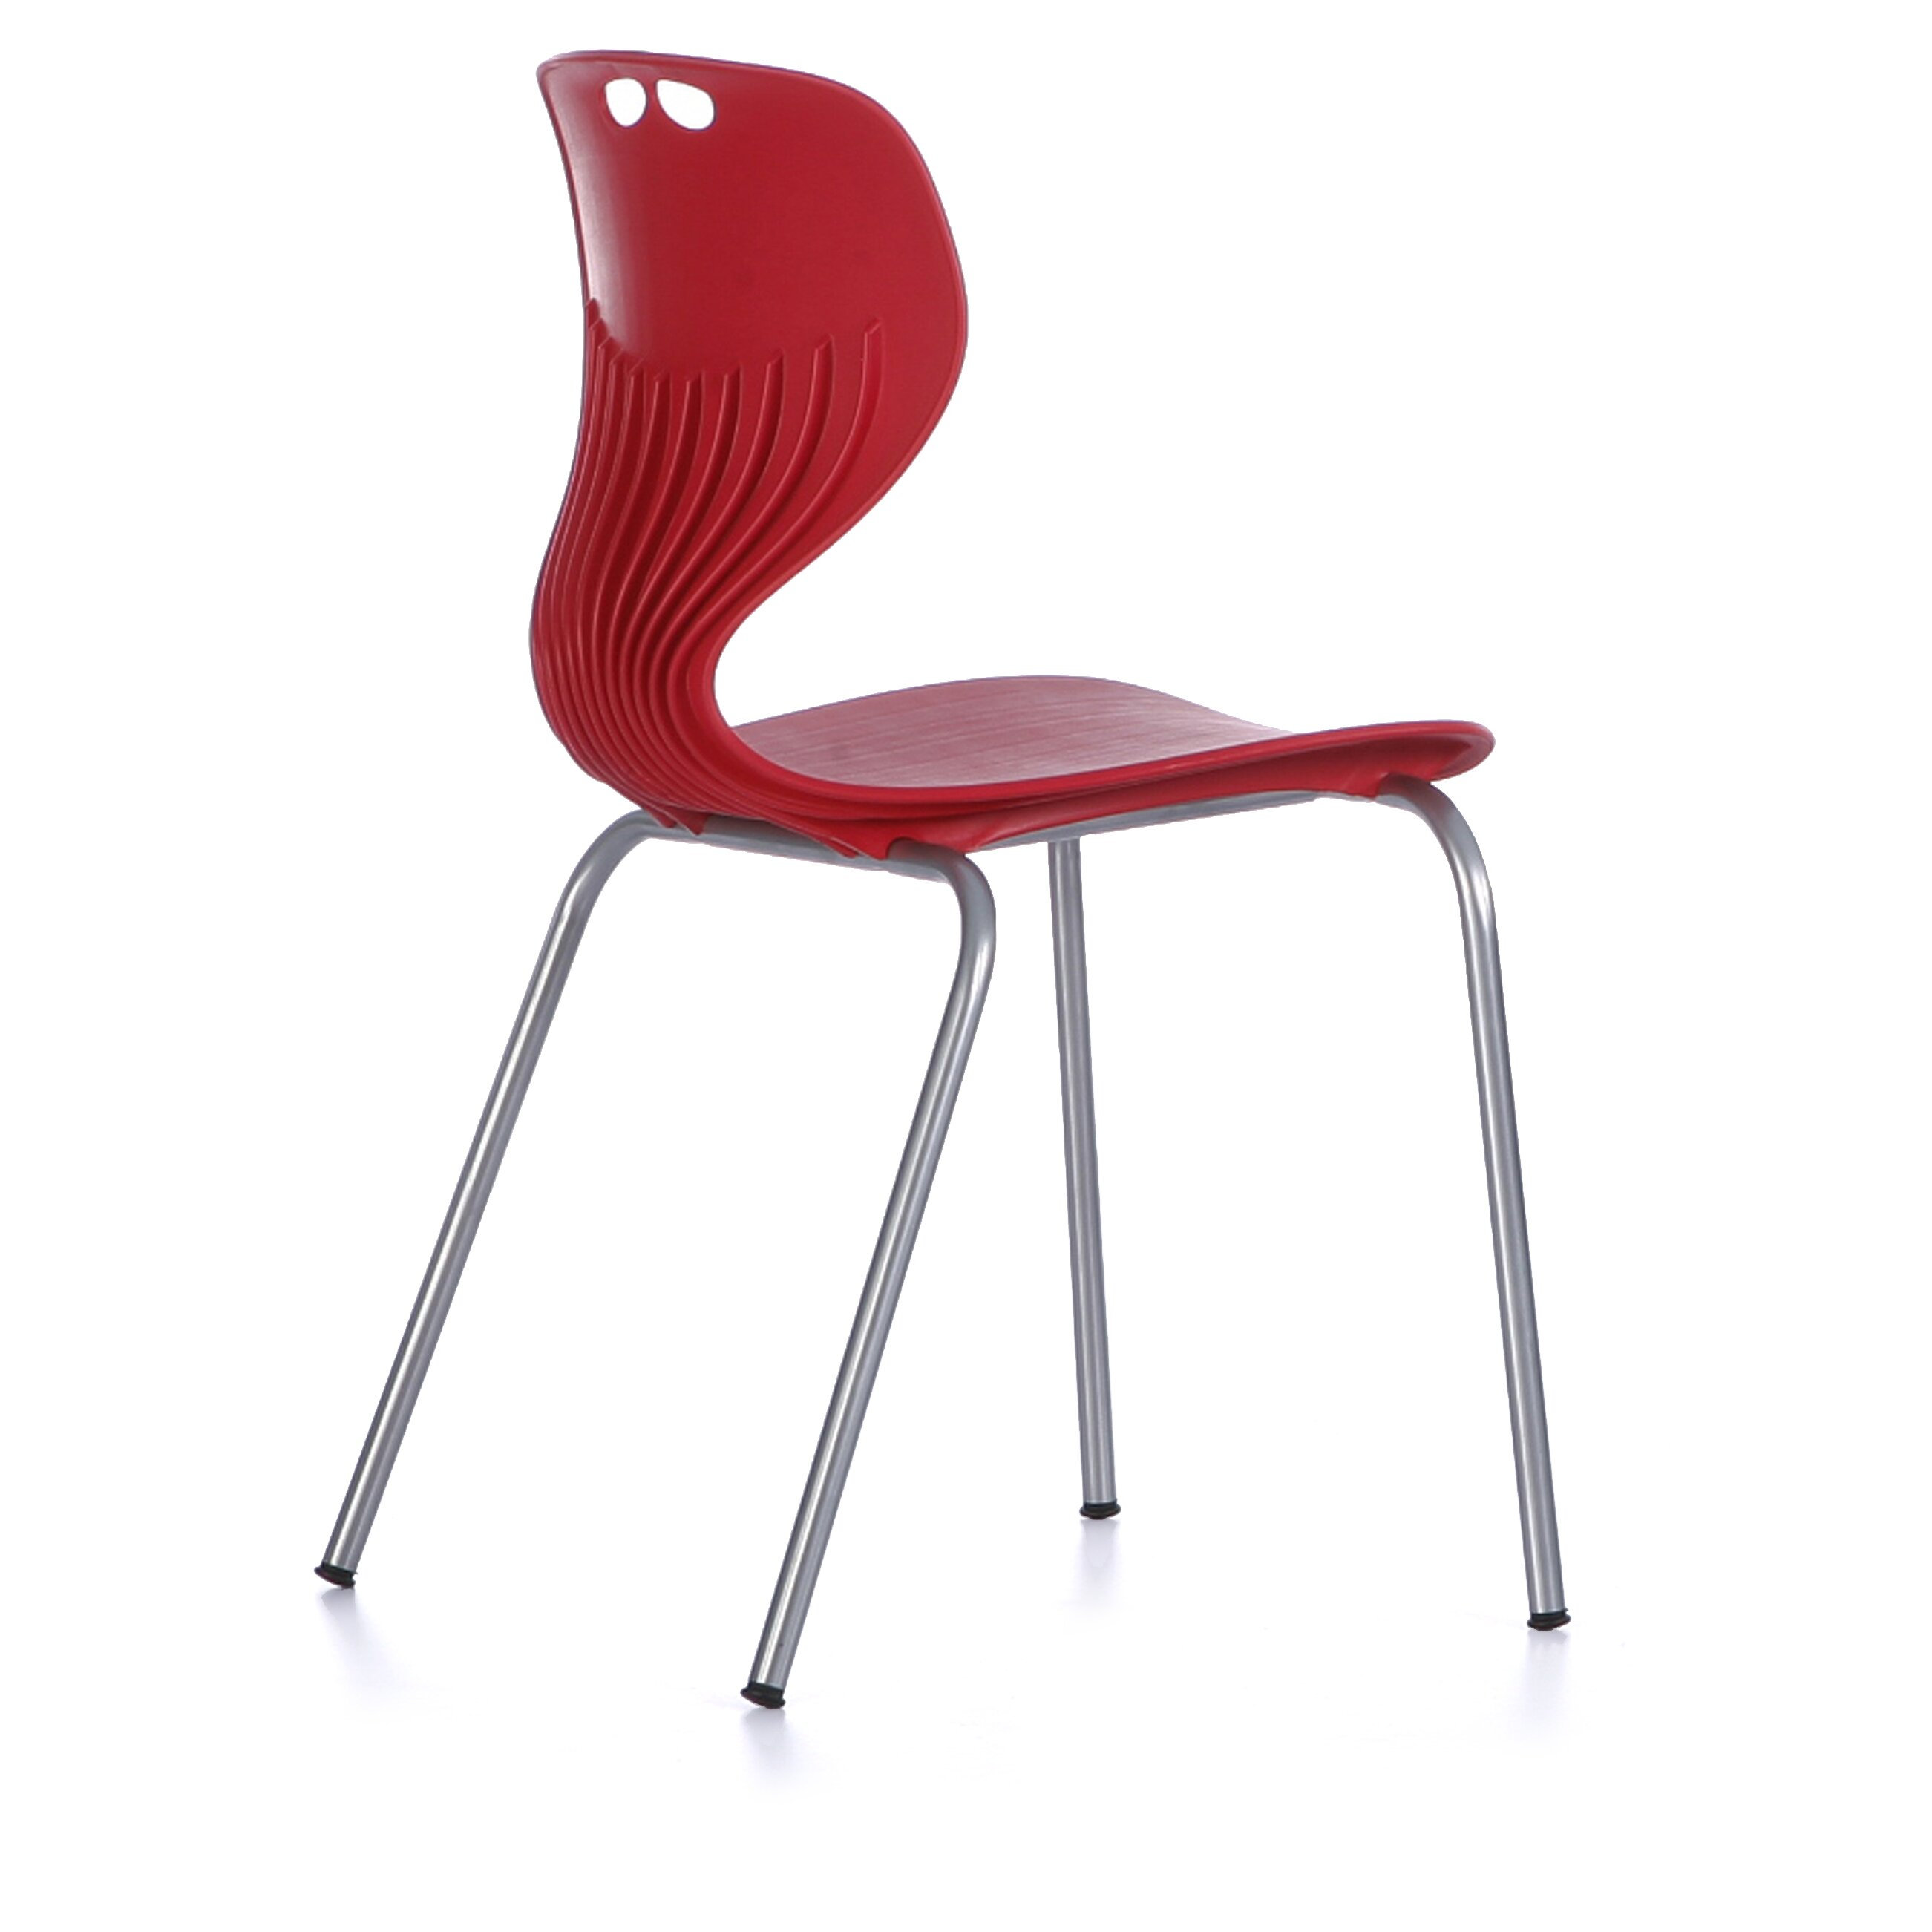 MiEN 18quot Plastic Classroom Chair Wayfair : 18 4 Leg Student Classroom Chair 30206101 from www.wayfair.com size 2603 x 2603 jpeg 275kB